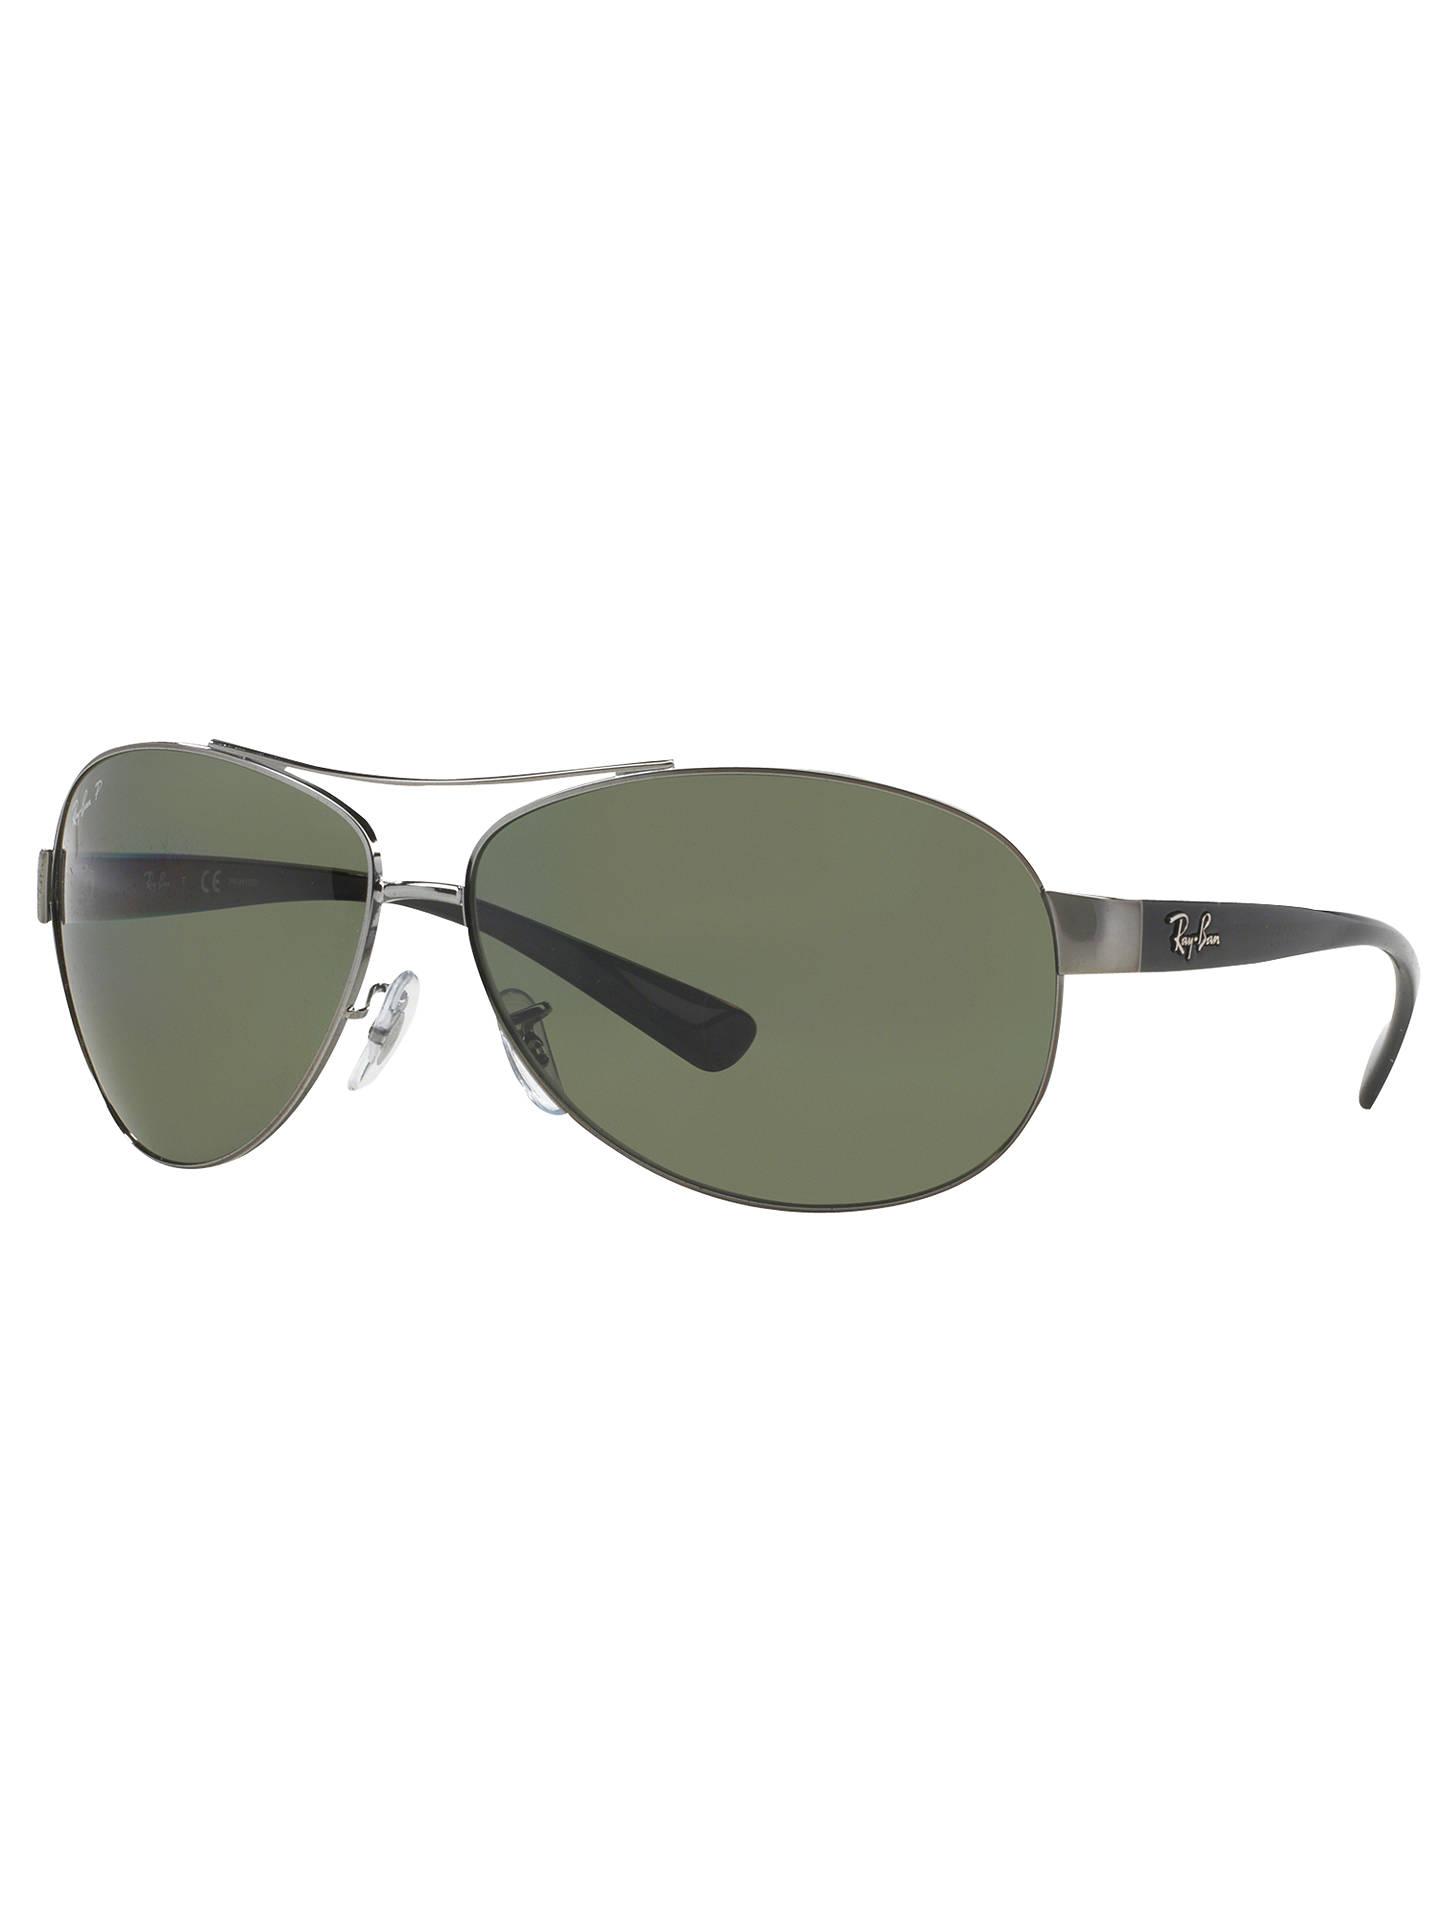 0b6acd79a6 Buy Ray-Ban RB3386 Polarised Oval Aviator Sunglasses, Gunmetal/Dark Green  Online at ...